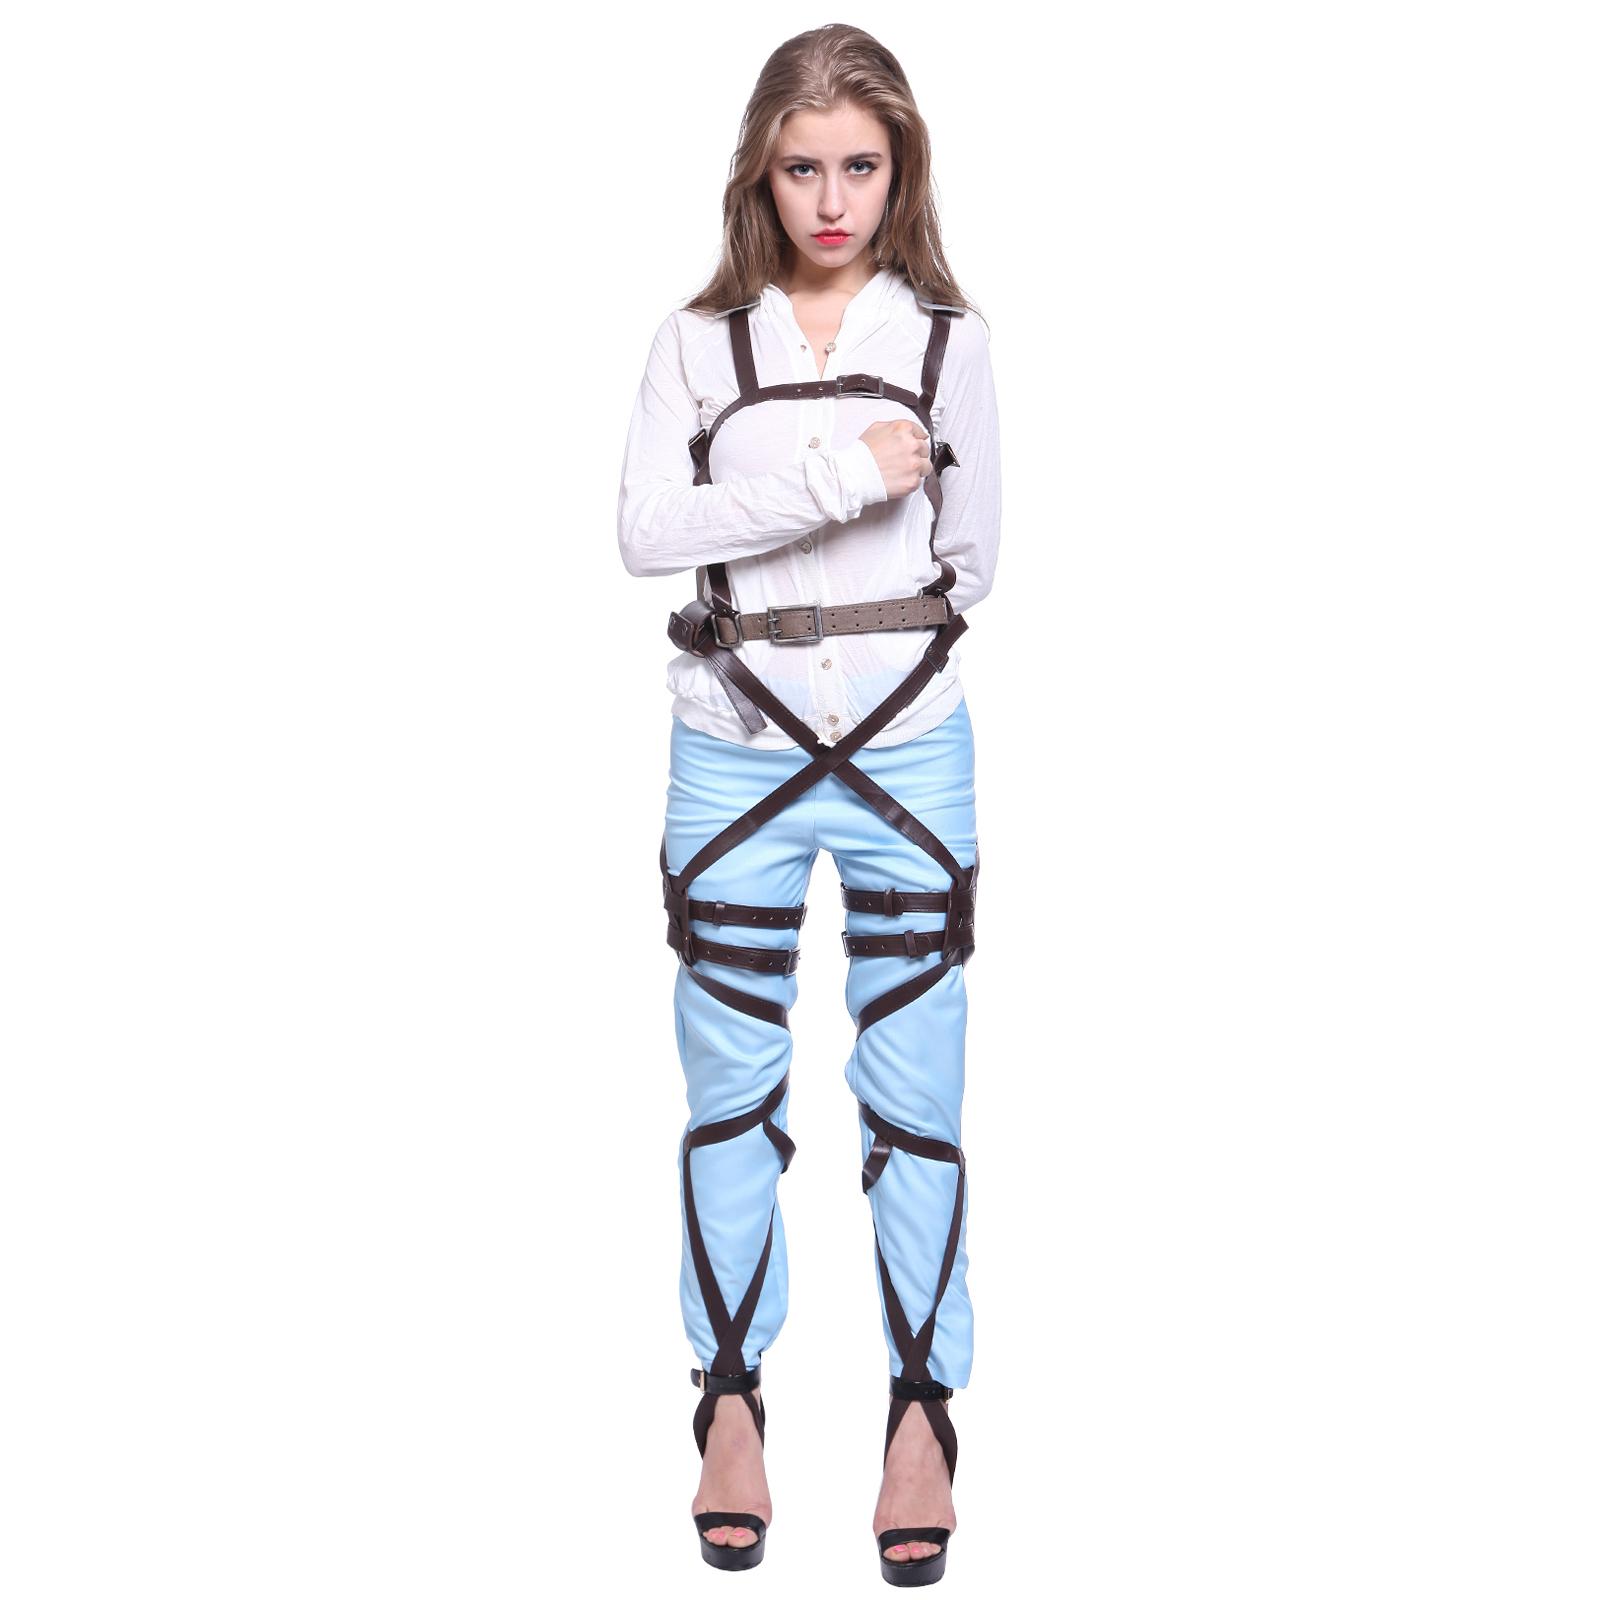 Cos Cosplay Shingeki no Kyojin Attack On Titan Adjustable Harness Straps Belts   eBay